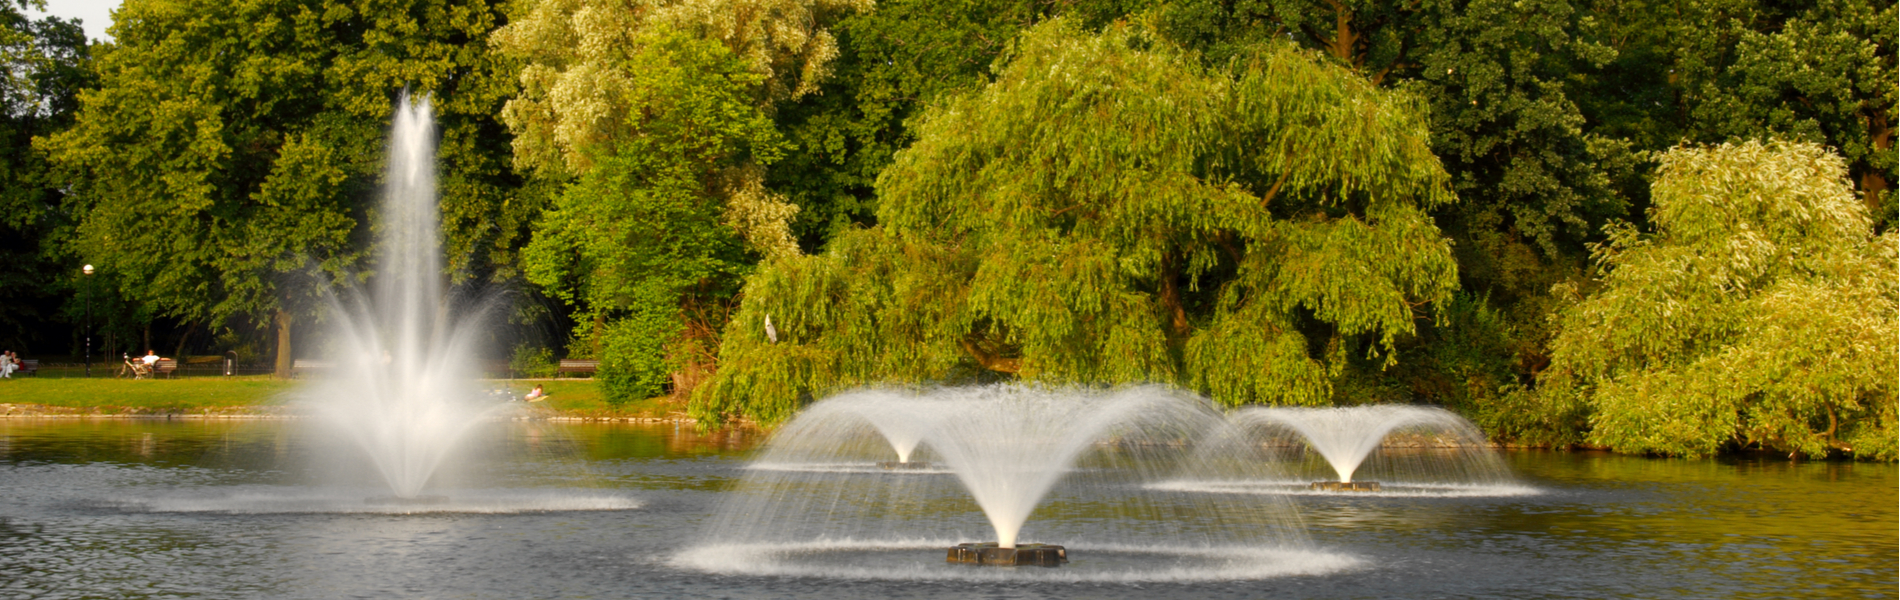 Benefits of Pond Aeration - Central Florida Aquatic Services